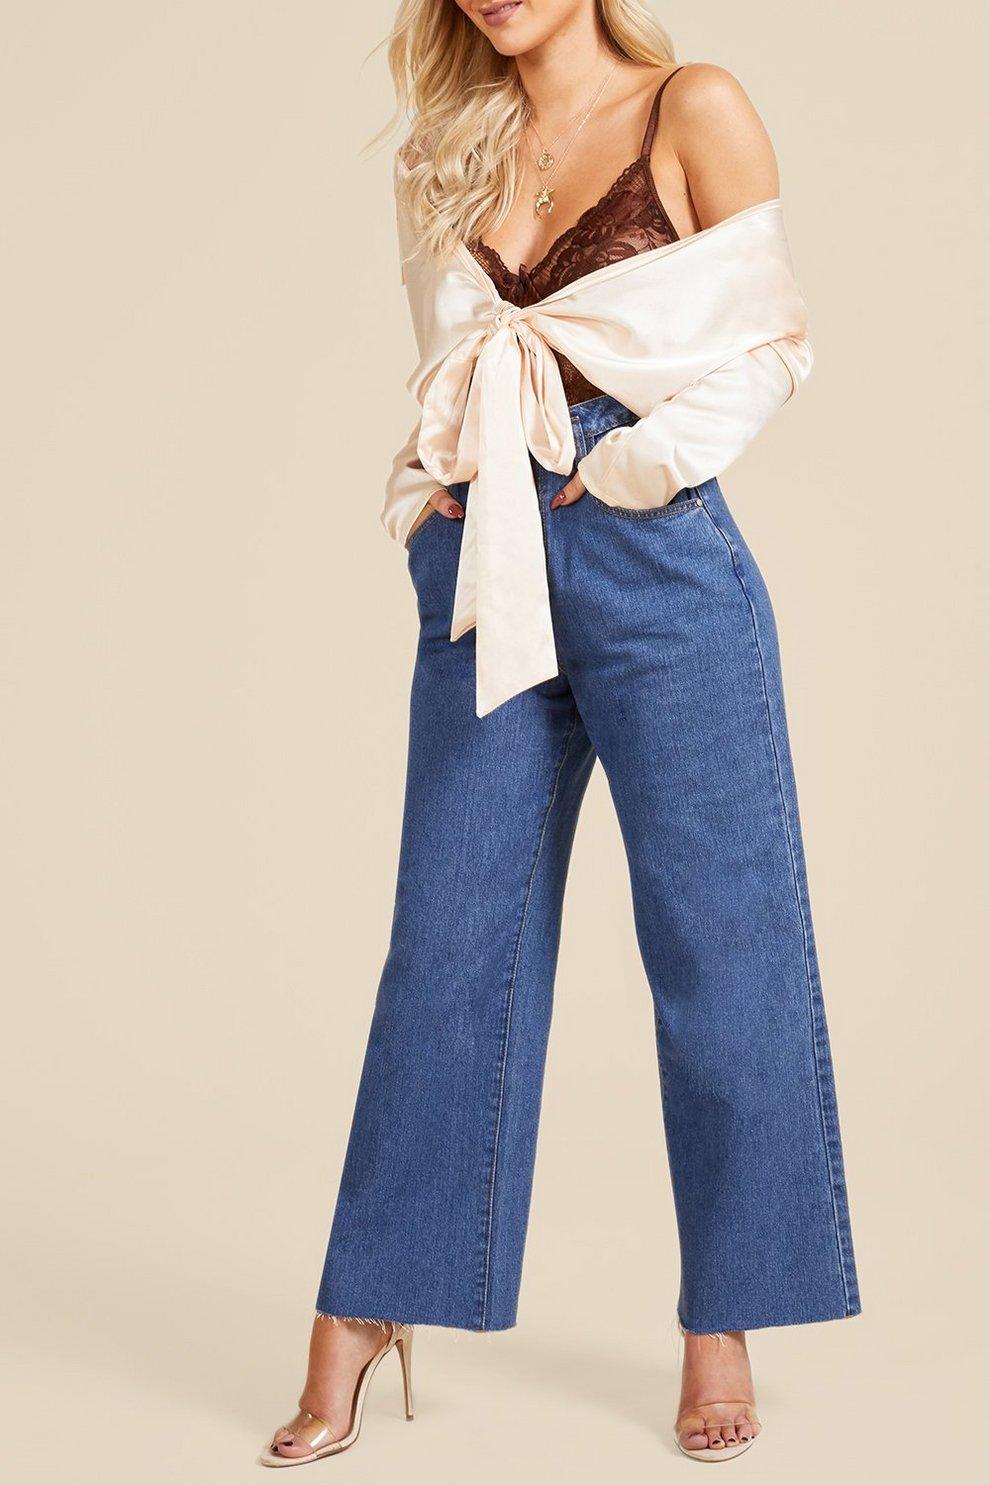 31b21396114e0 Cinched In High Waist Crop Wide Leg Jeans